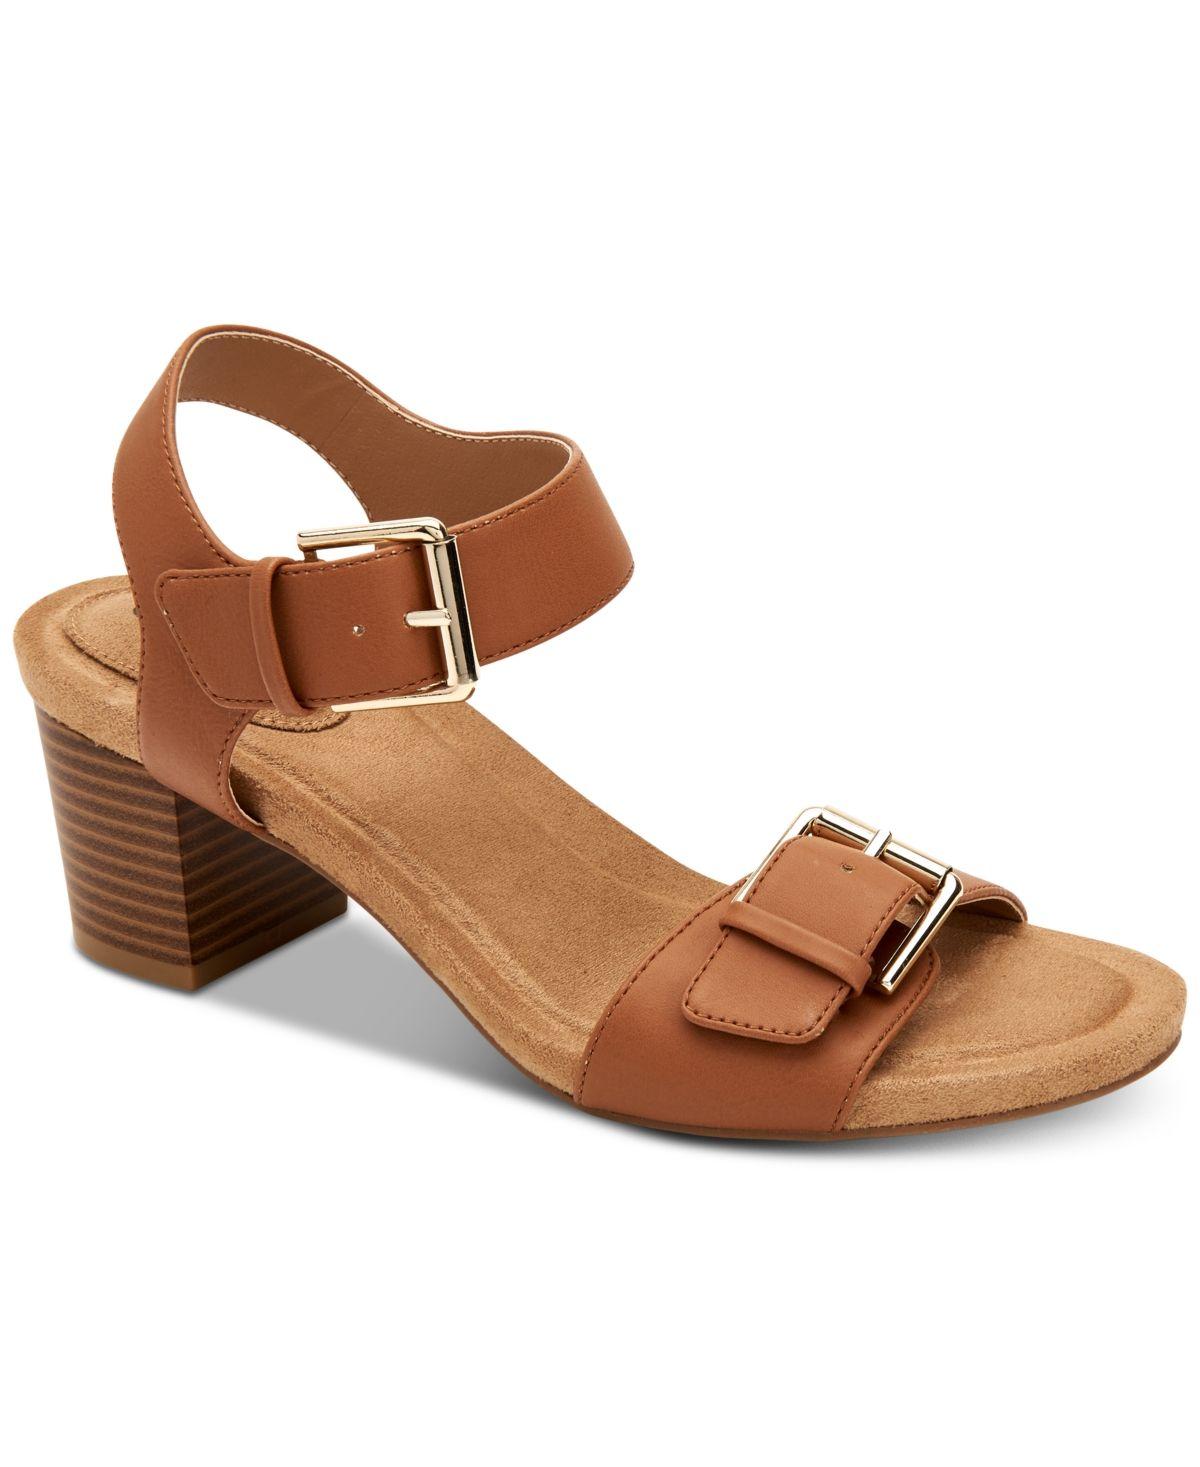 Giani Bernini Women S Montana Dress Sandals Created For Macy S Deer Dress Sandals Giani Bernini Flip Flop Shoes